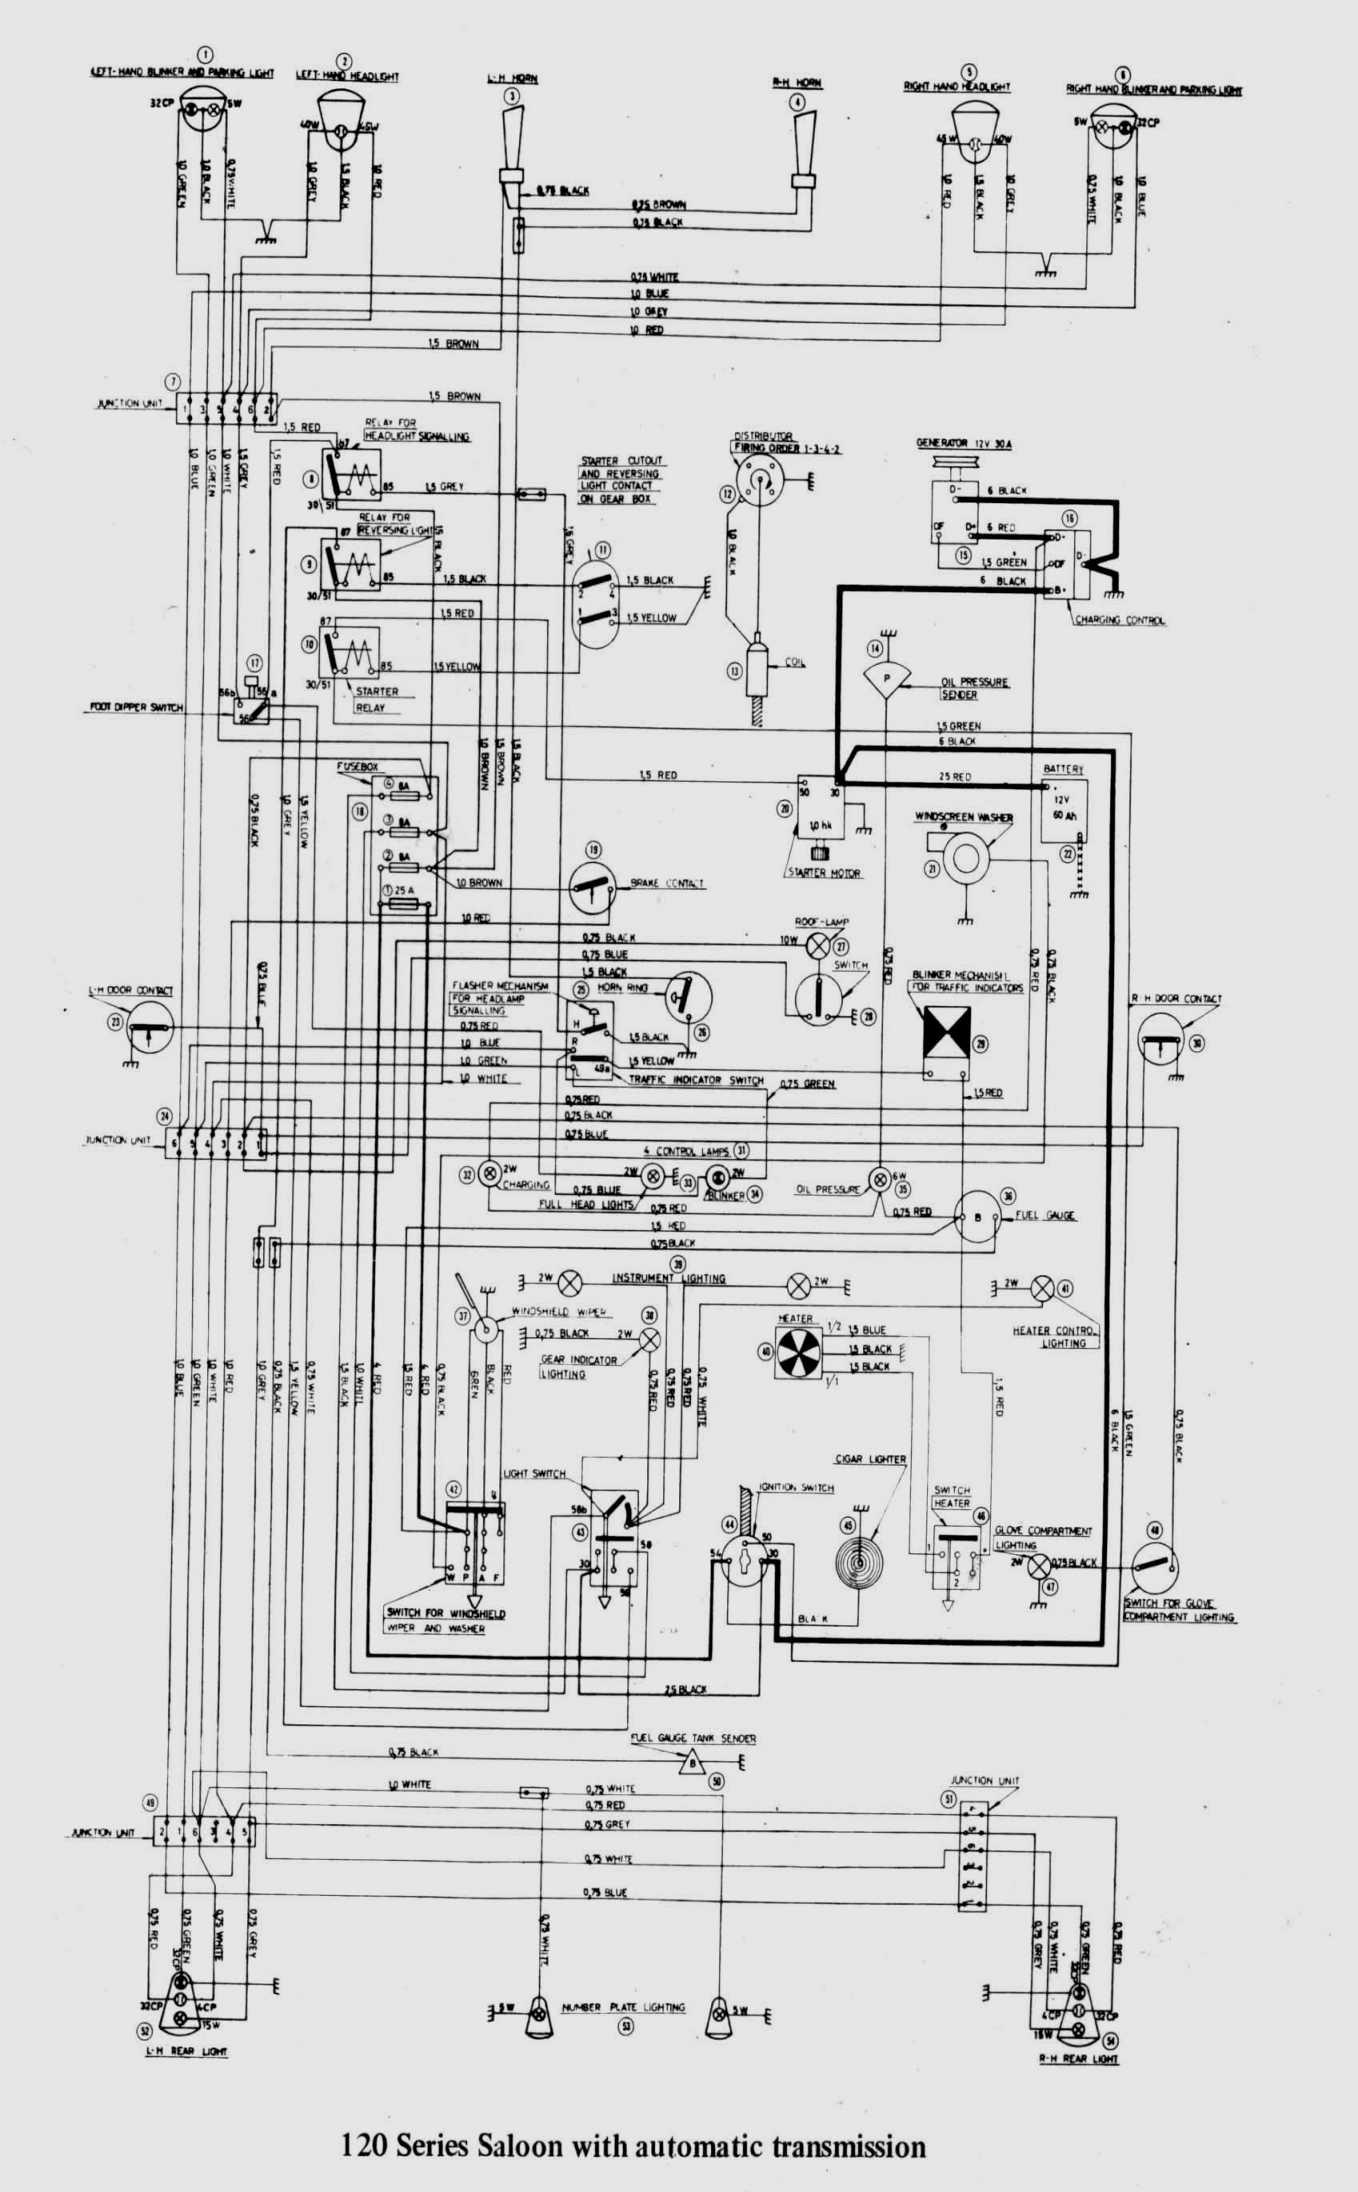 [DIAGRAM] Volvo Semi Engine Diagram FULL Version HD